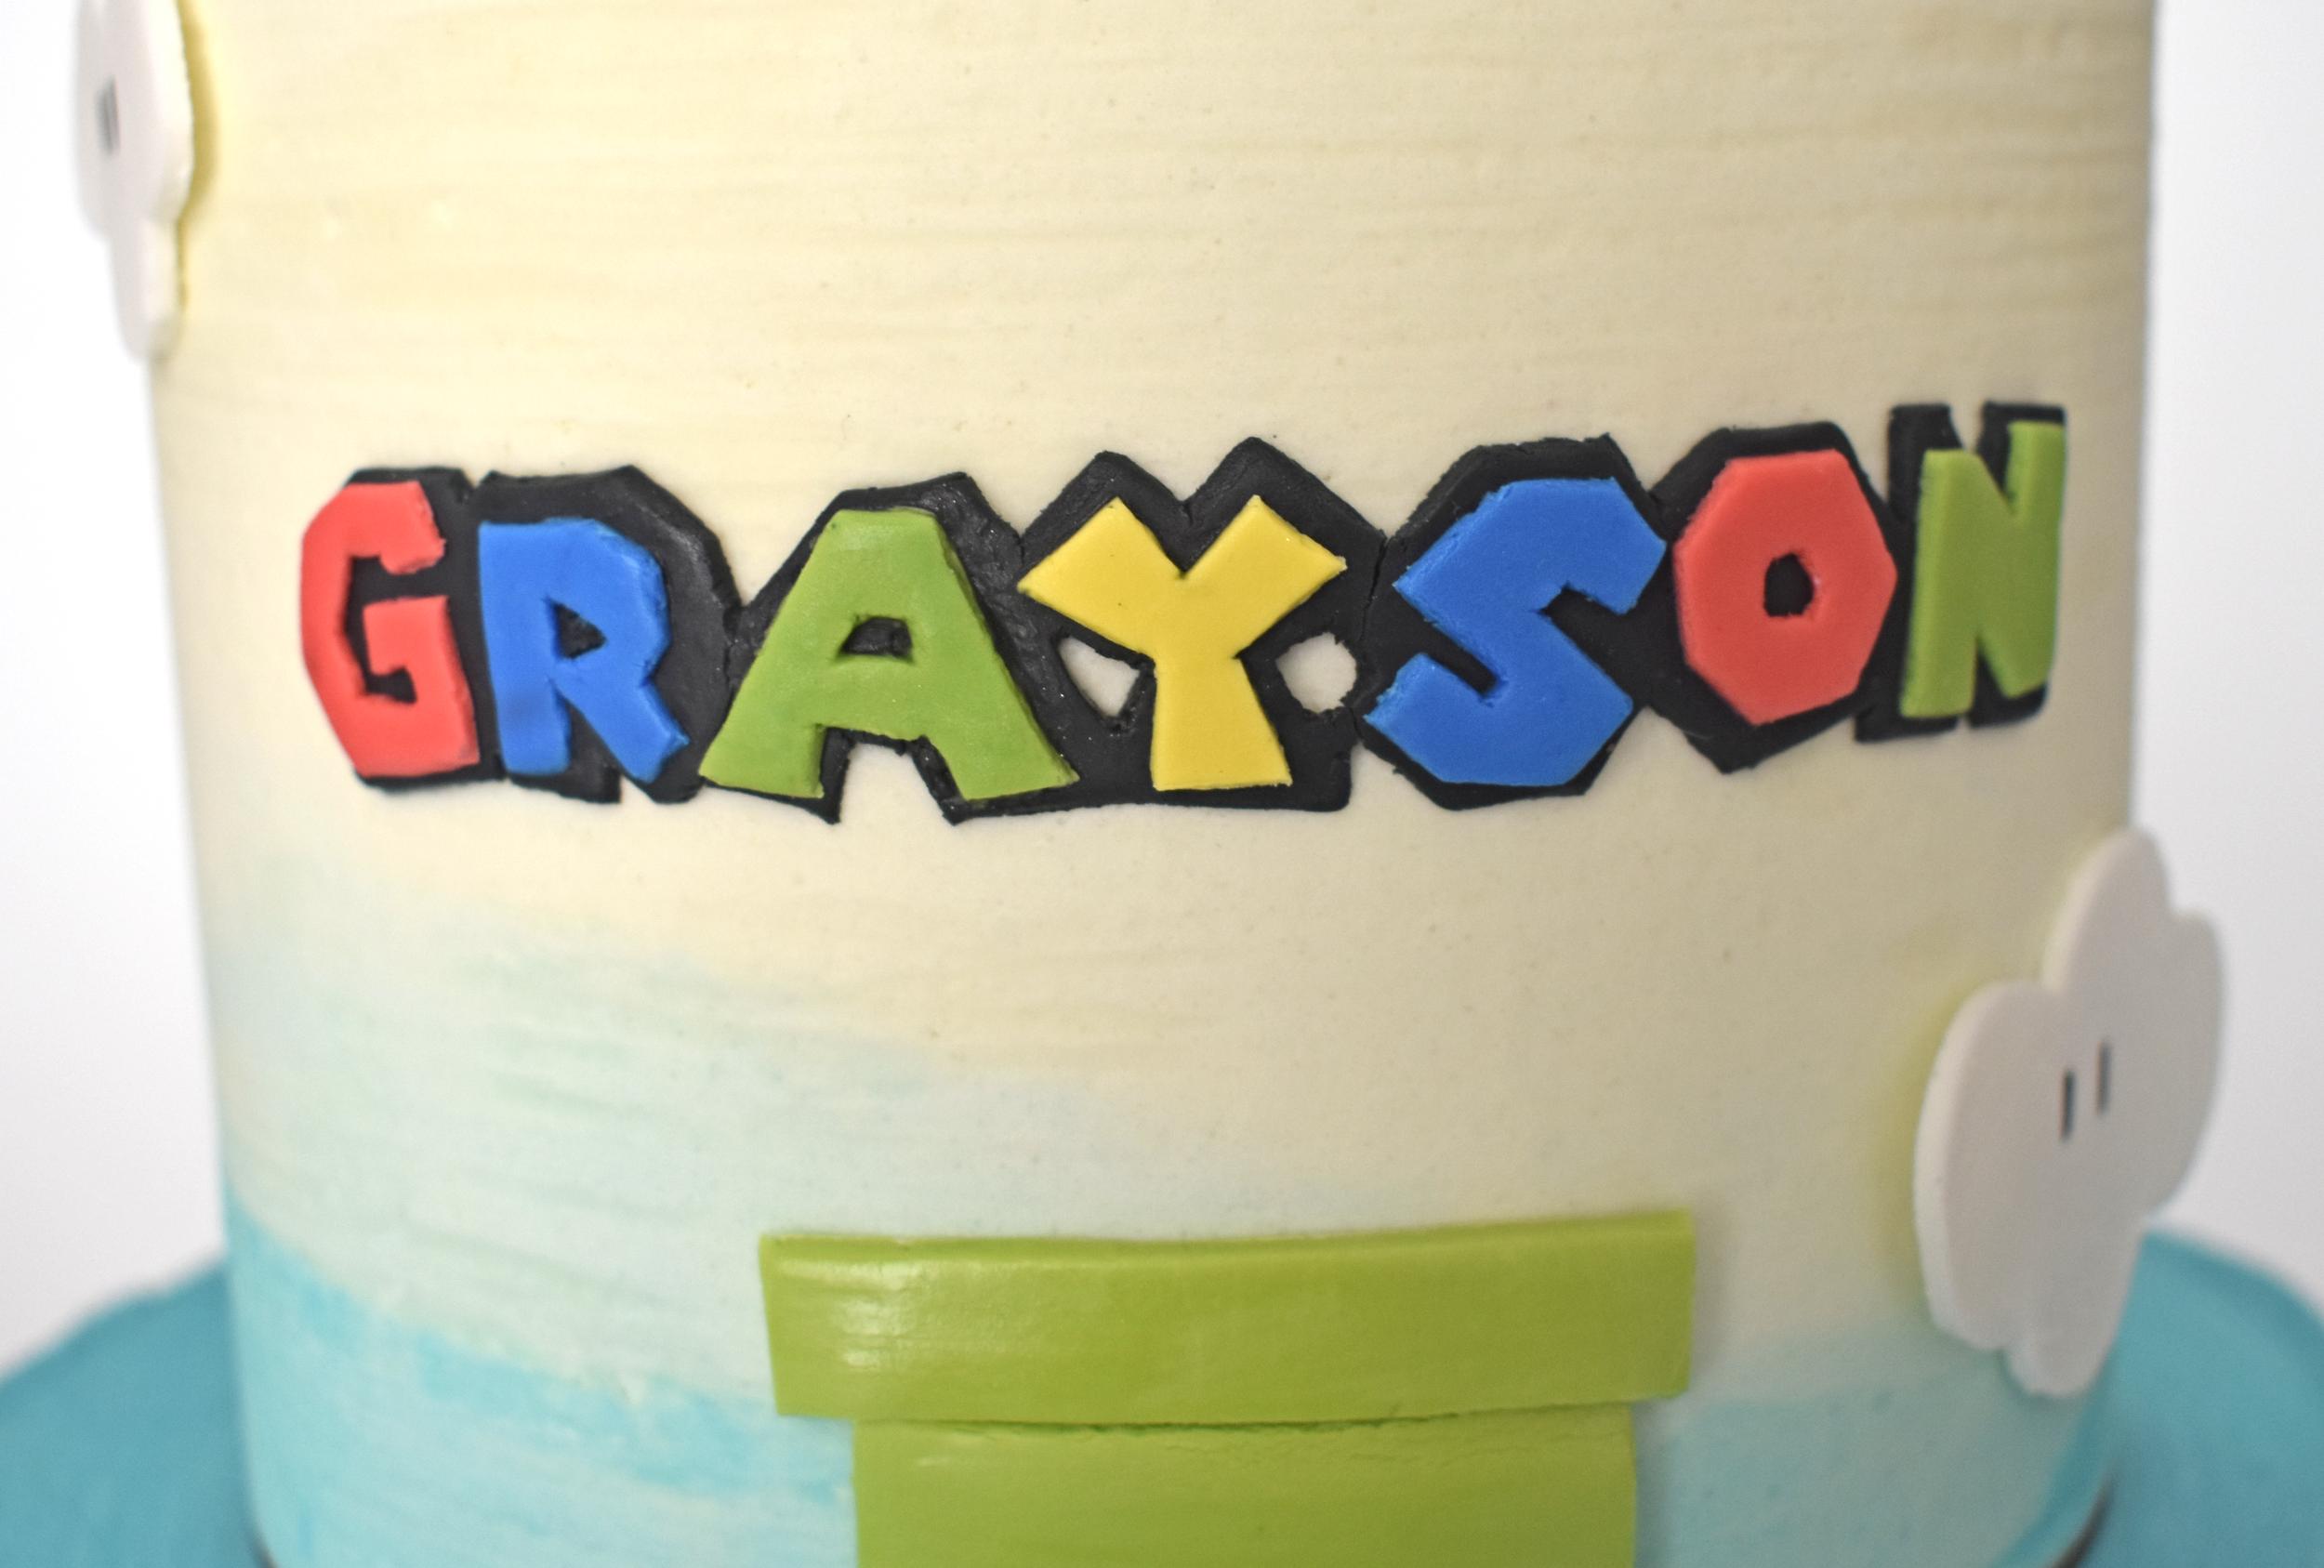 Graysons-Cake-Name.png